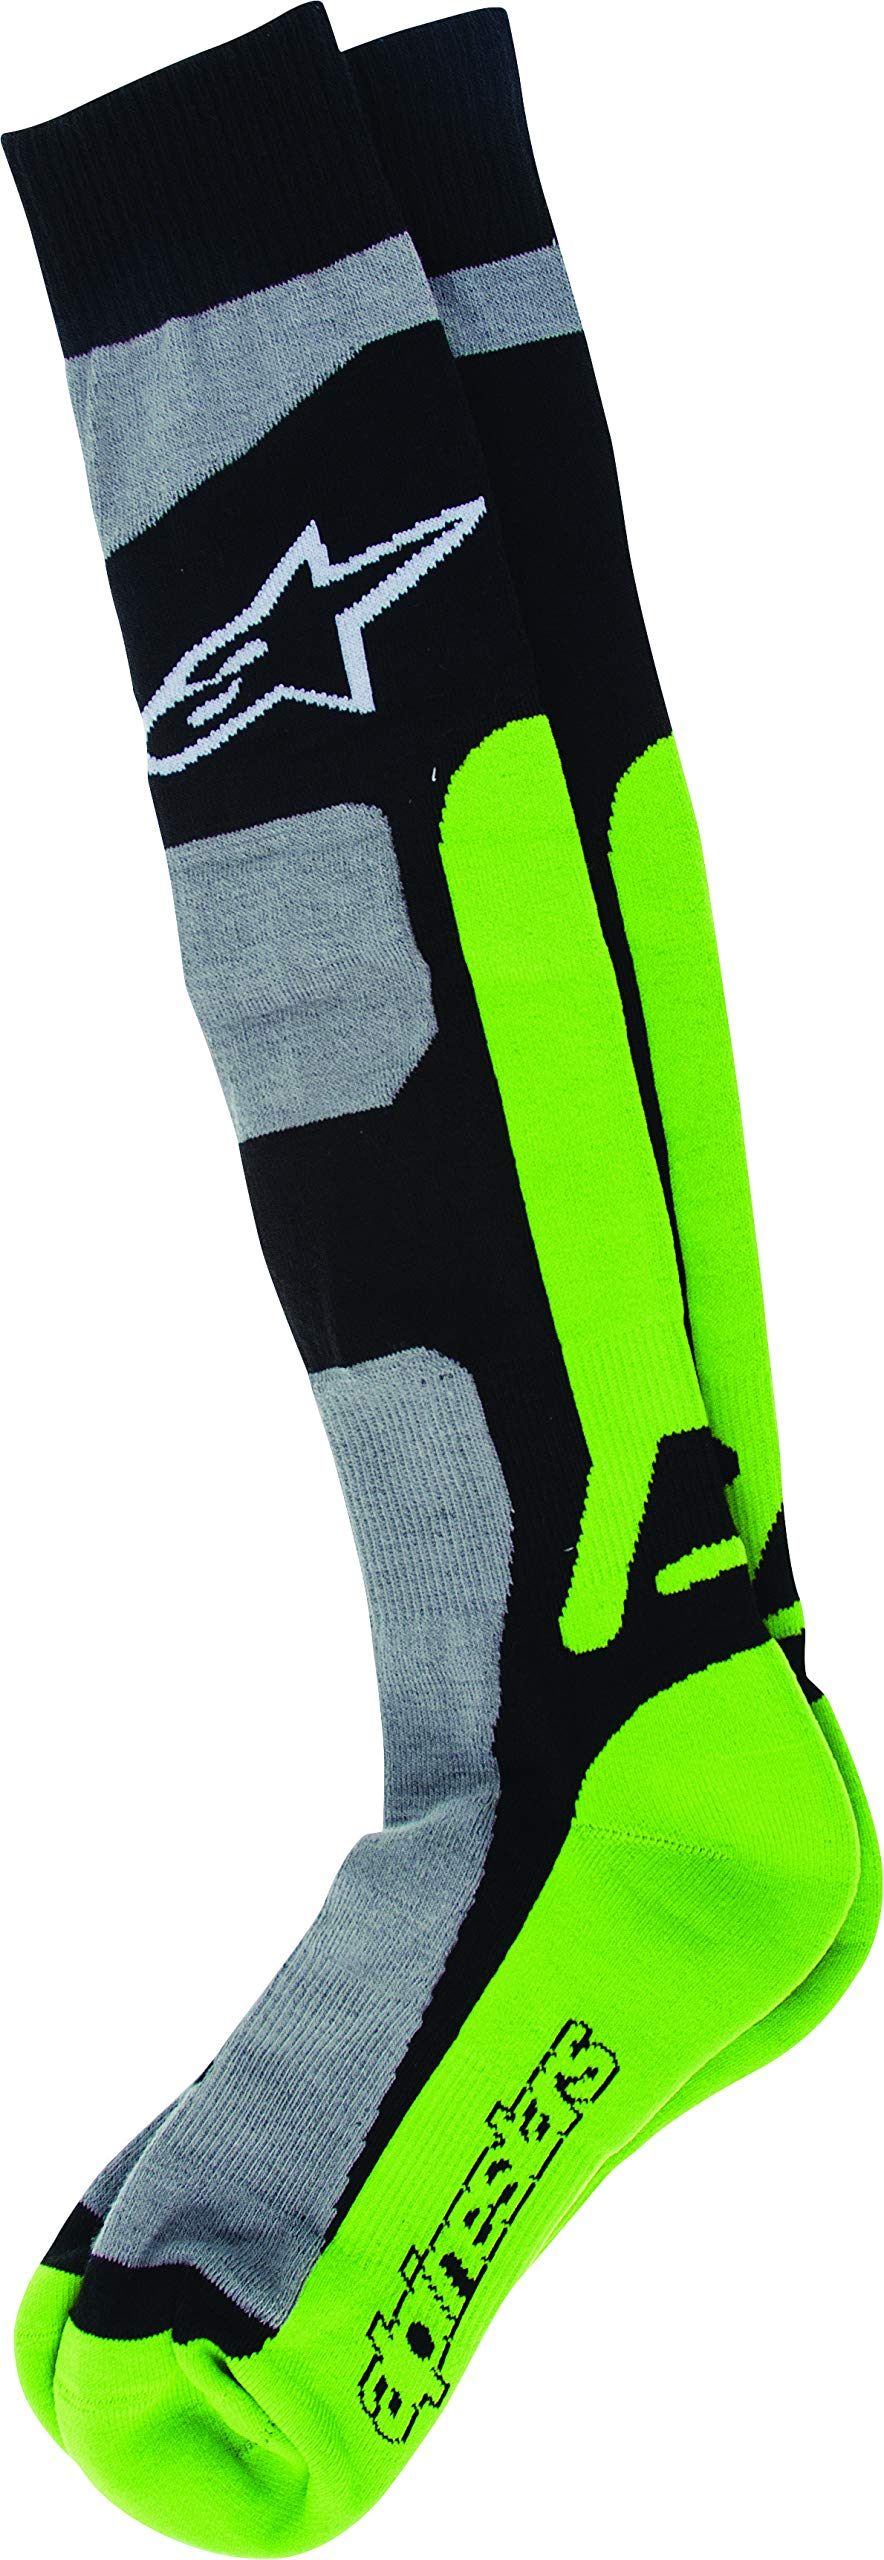 Alpinestars Men's 4702114-916-LXL Sock (Coolmax) (Green, X-Large), Large/X-Large